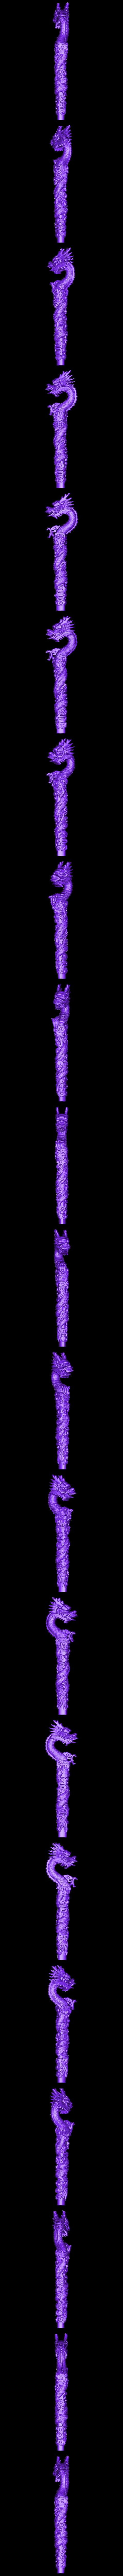 dragonCrutch.stl Download free STL file dragon crutch • 3D printer object, stlfilesfree